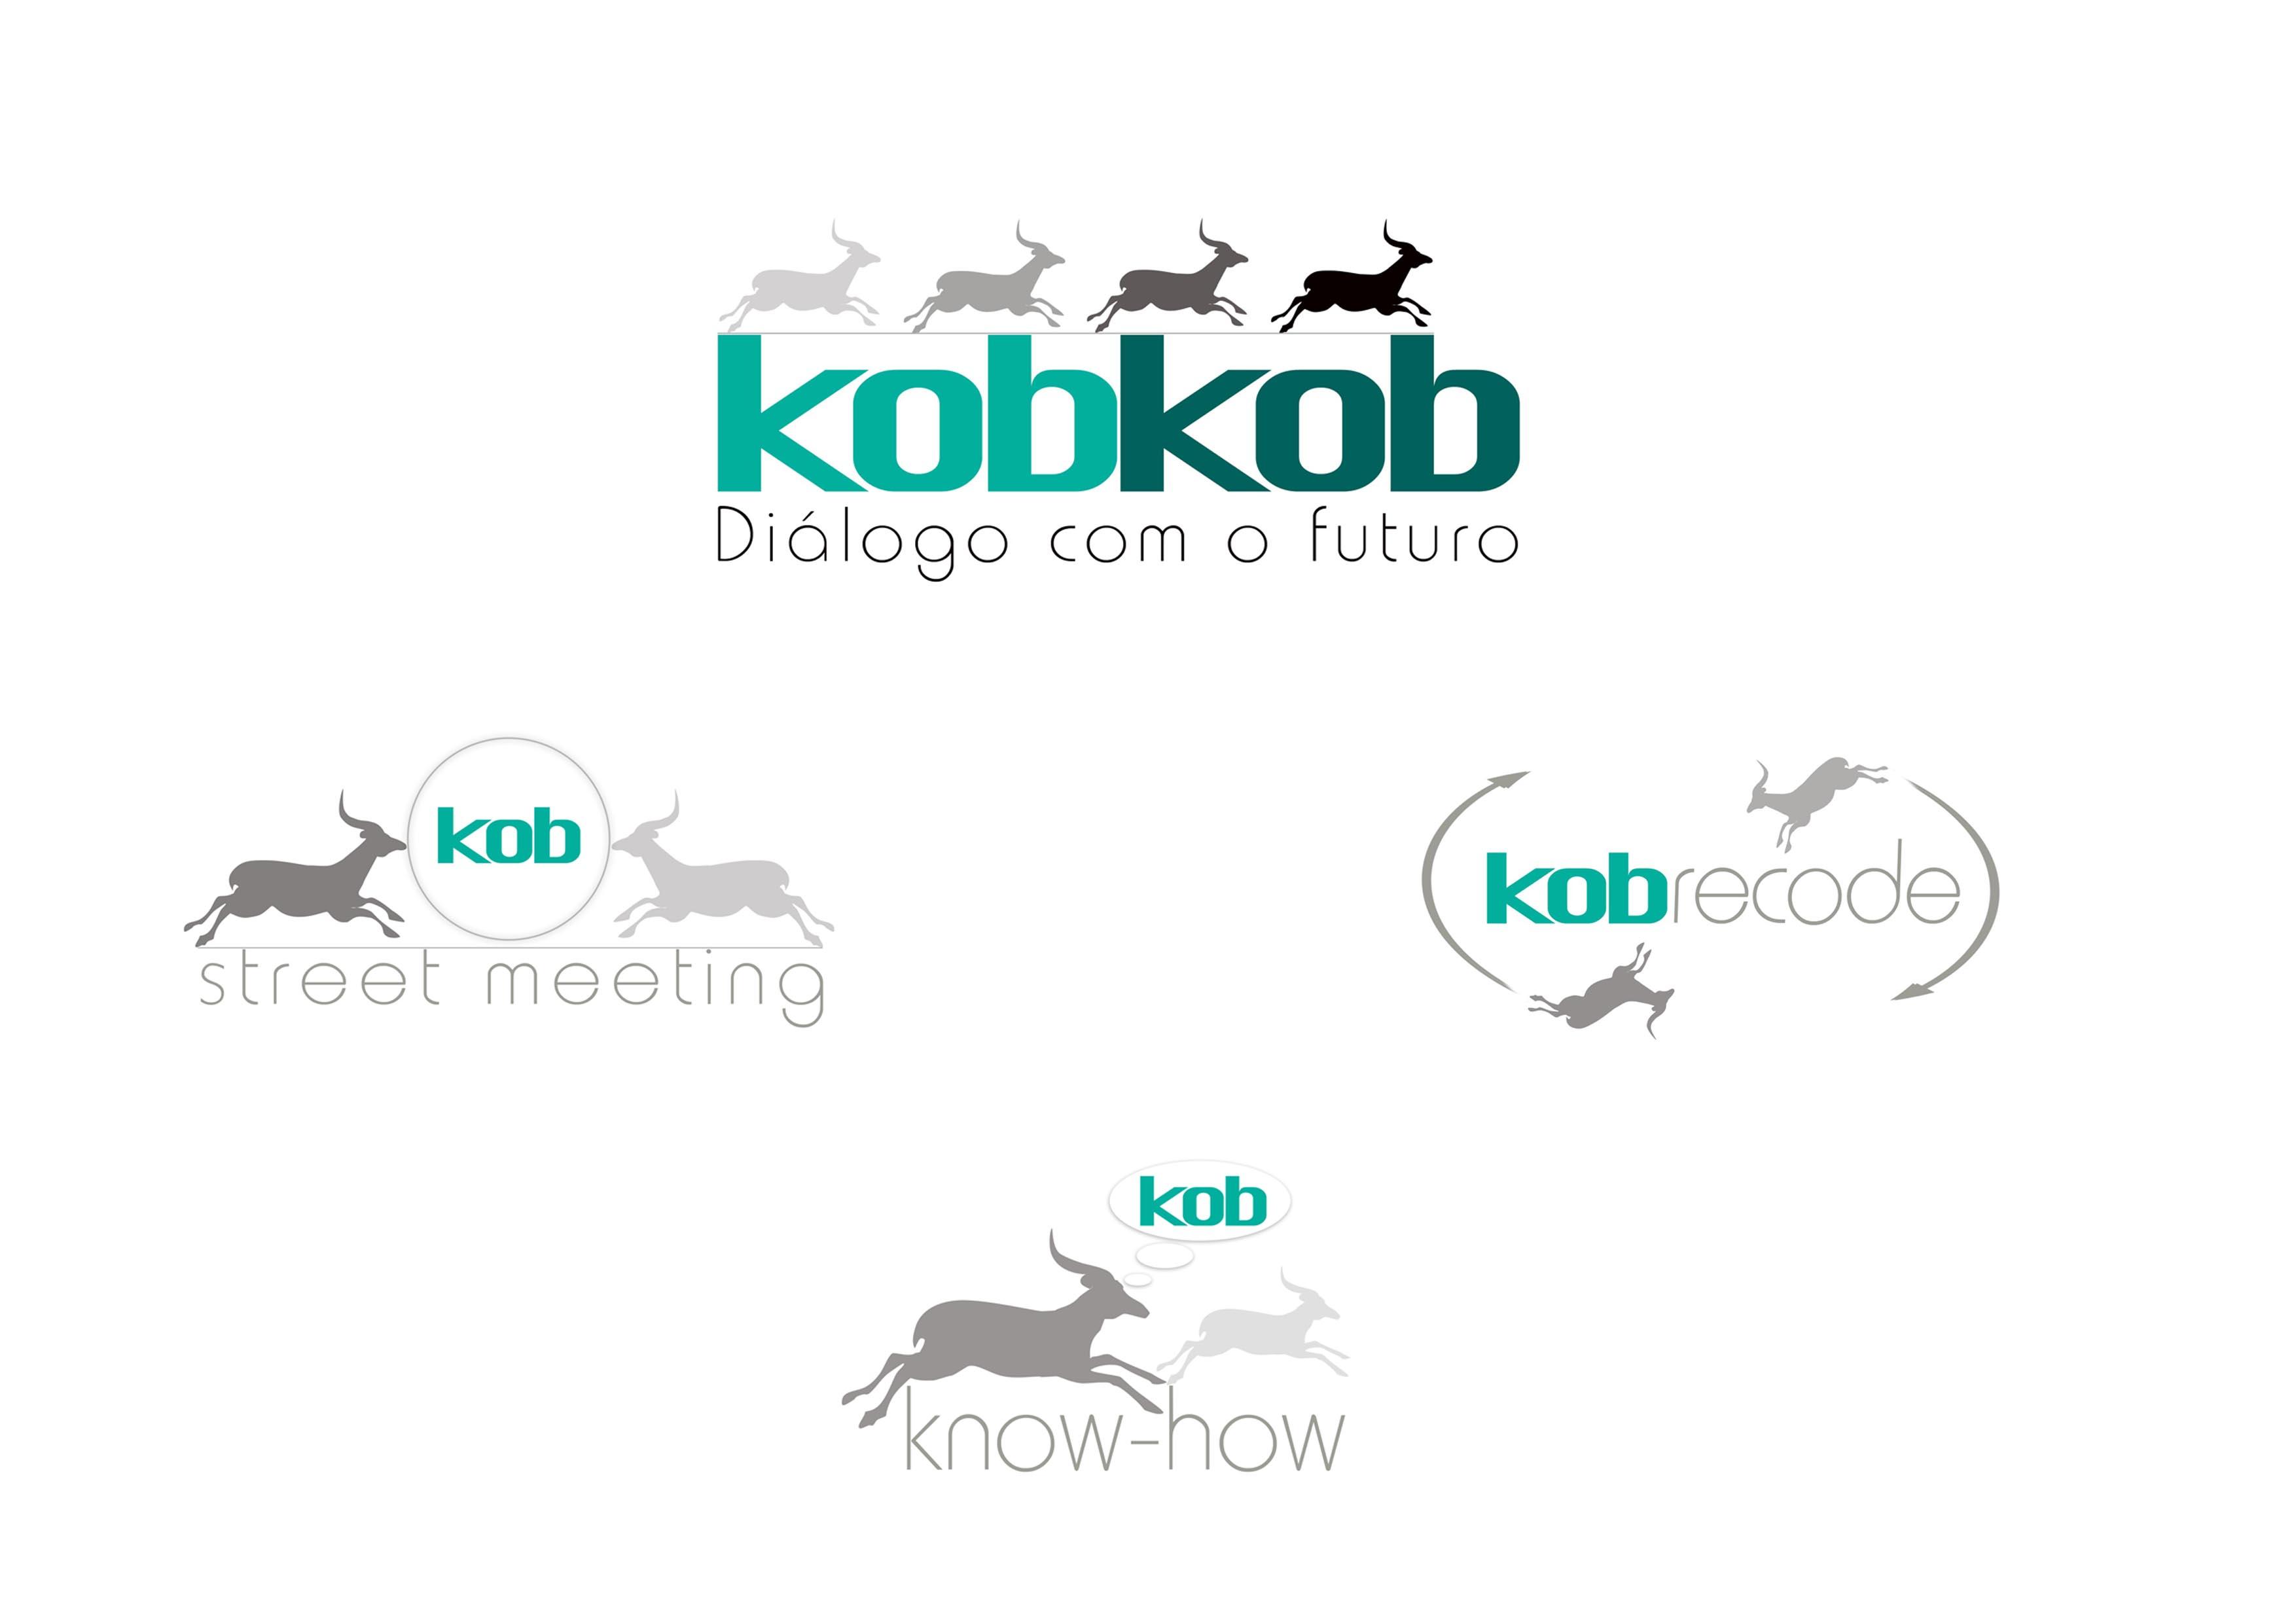 marcas Kob Kob cópia